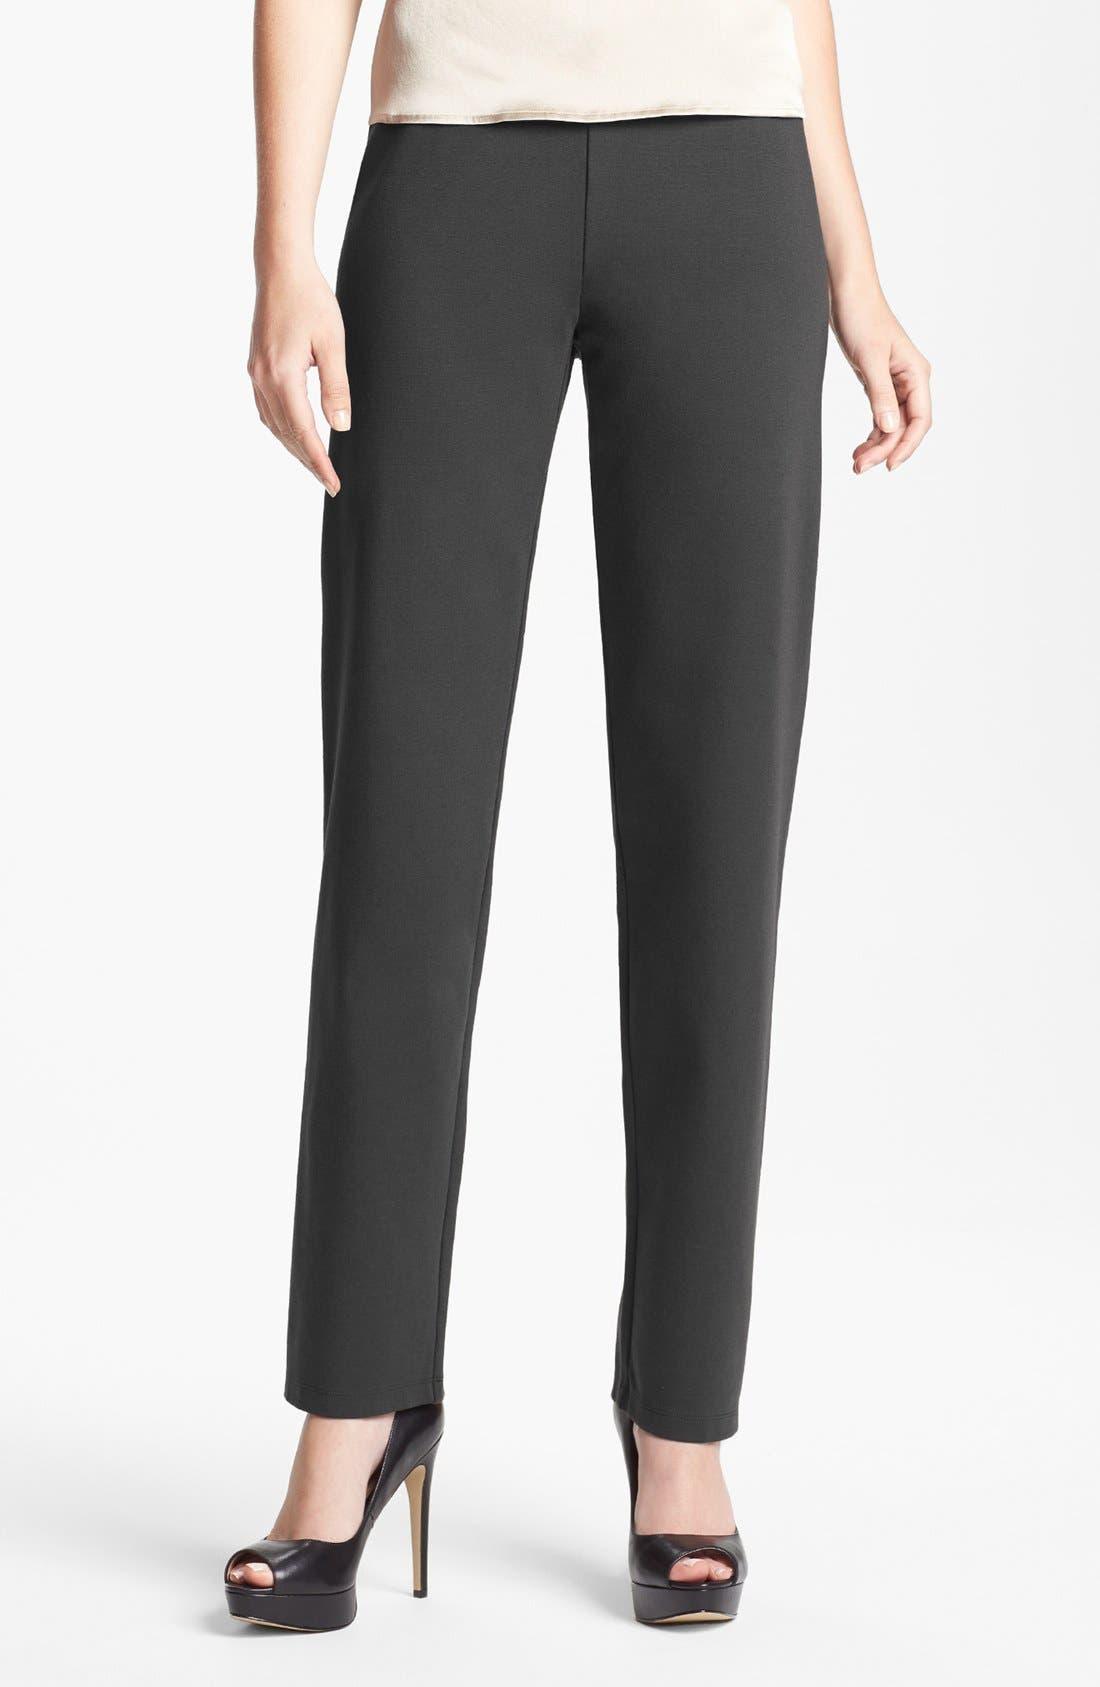 Alternate Image 1 Selected - Eileen Fisher Slim Pull-On Pants